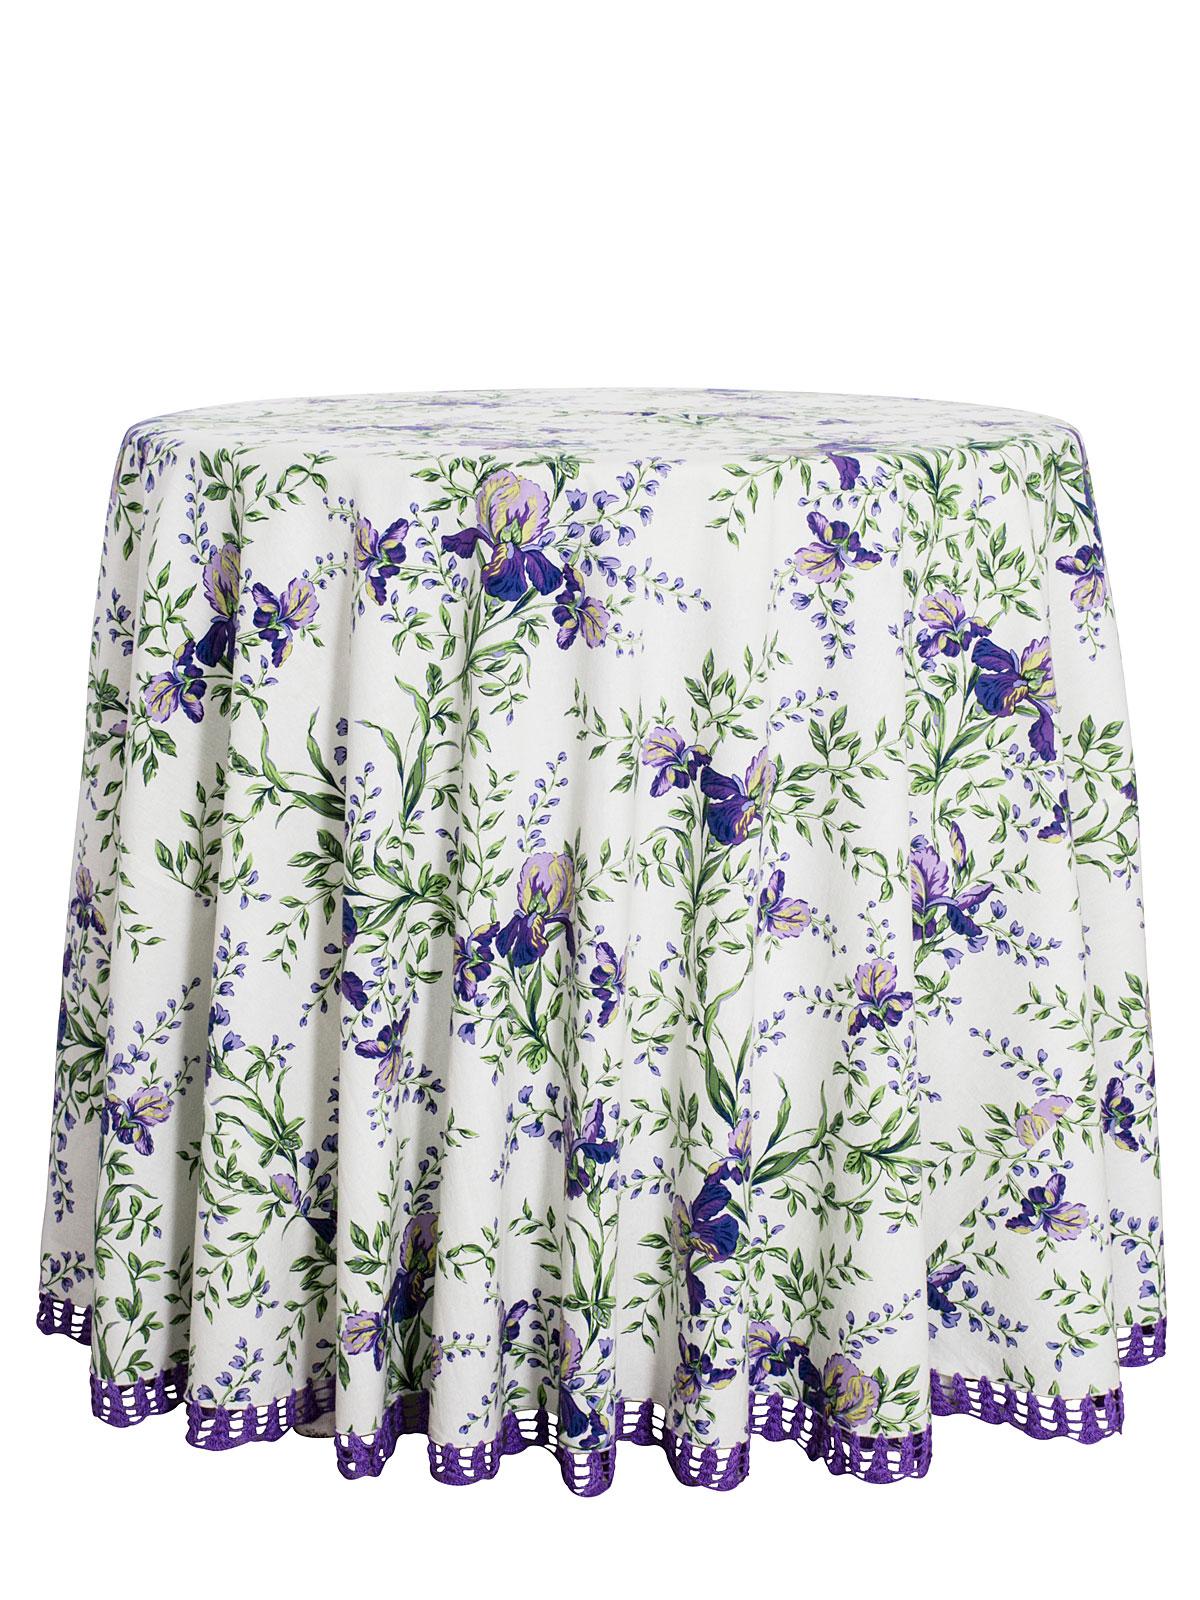 Irresistible Iris Crochet Round Tablecloth Linens Kitchen